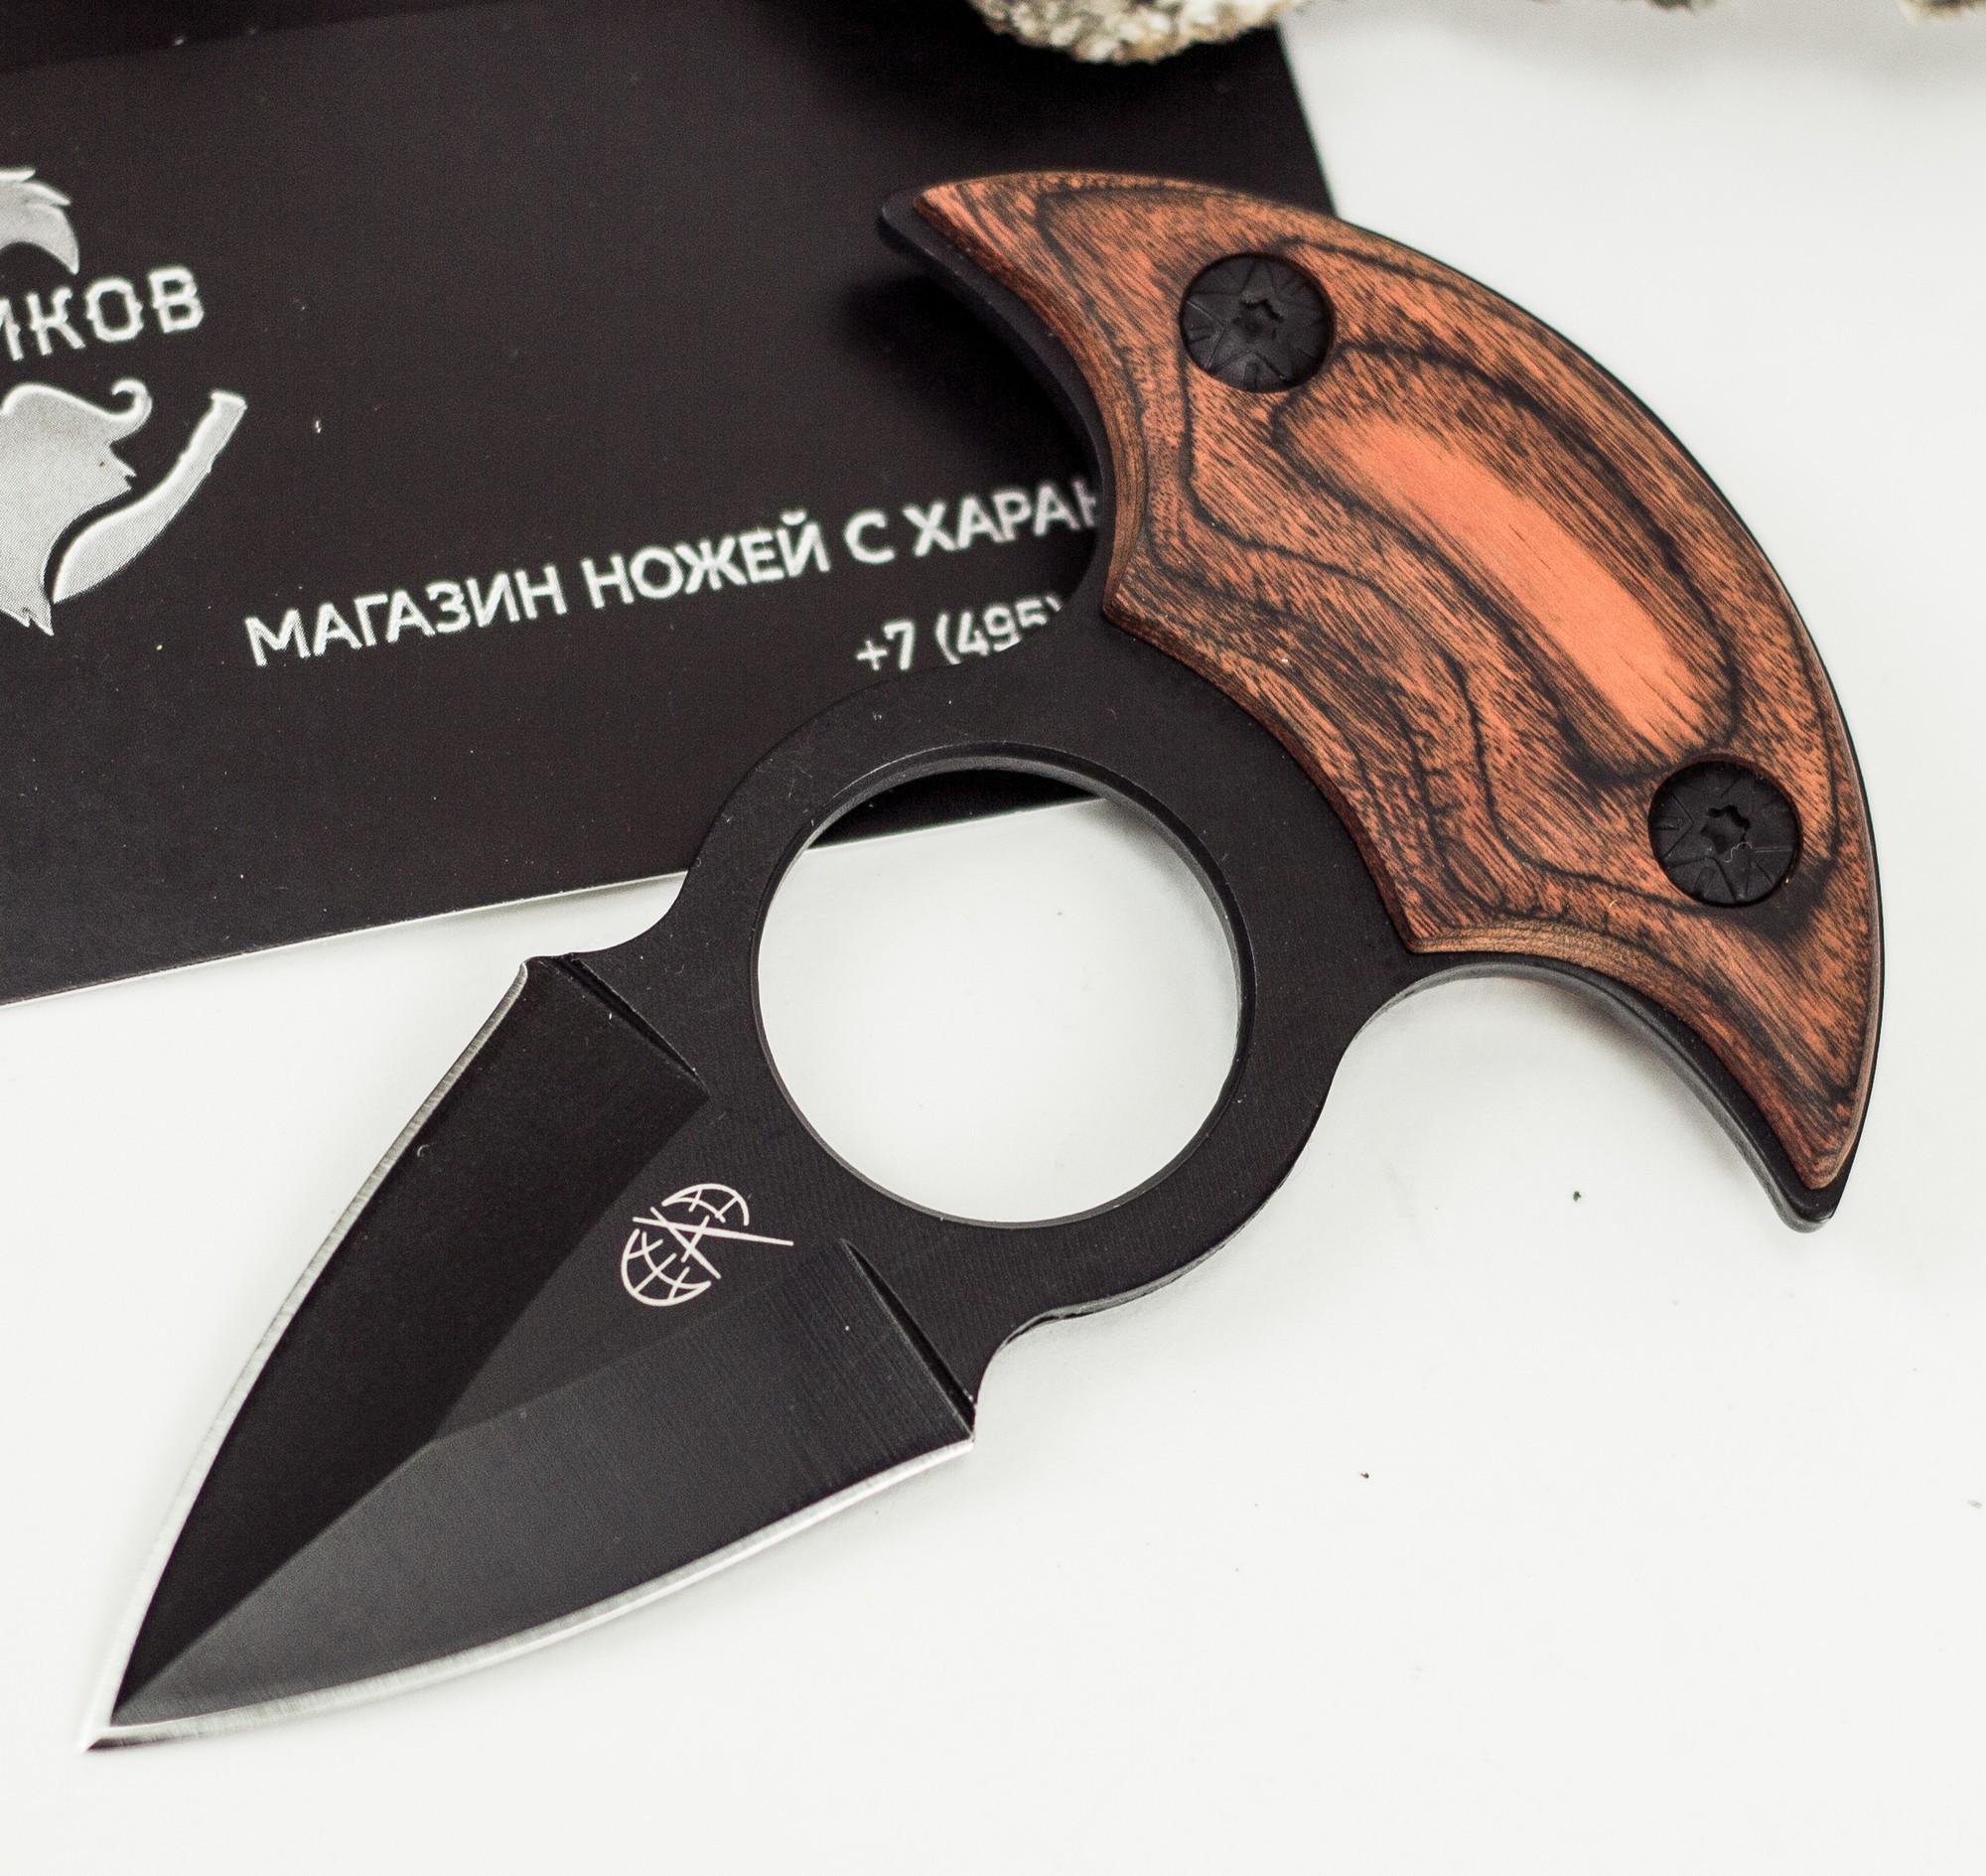 Фото 4 - Тычковый нож 1202B от Pirat